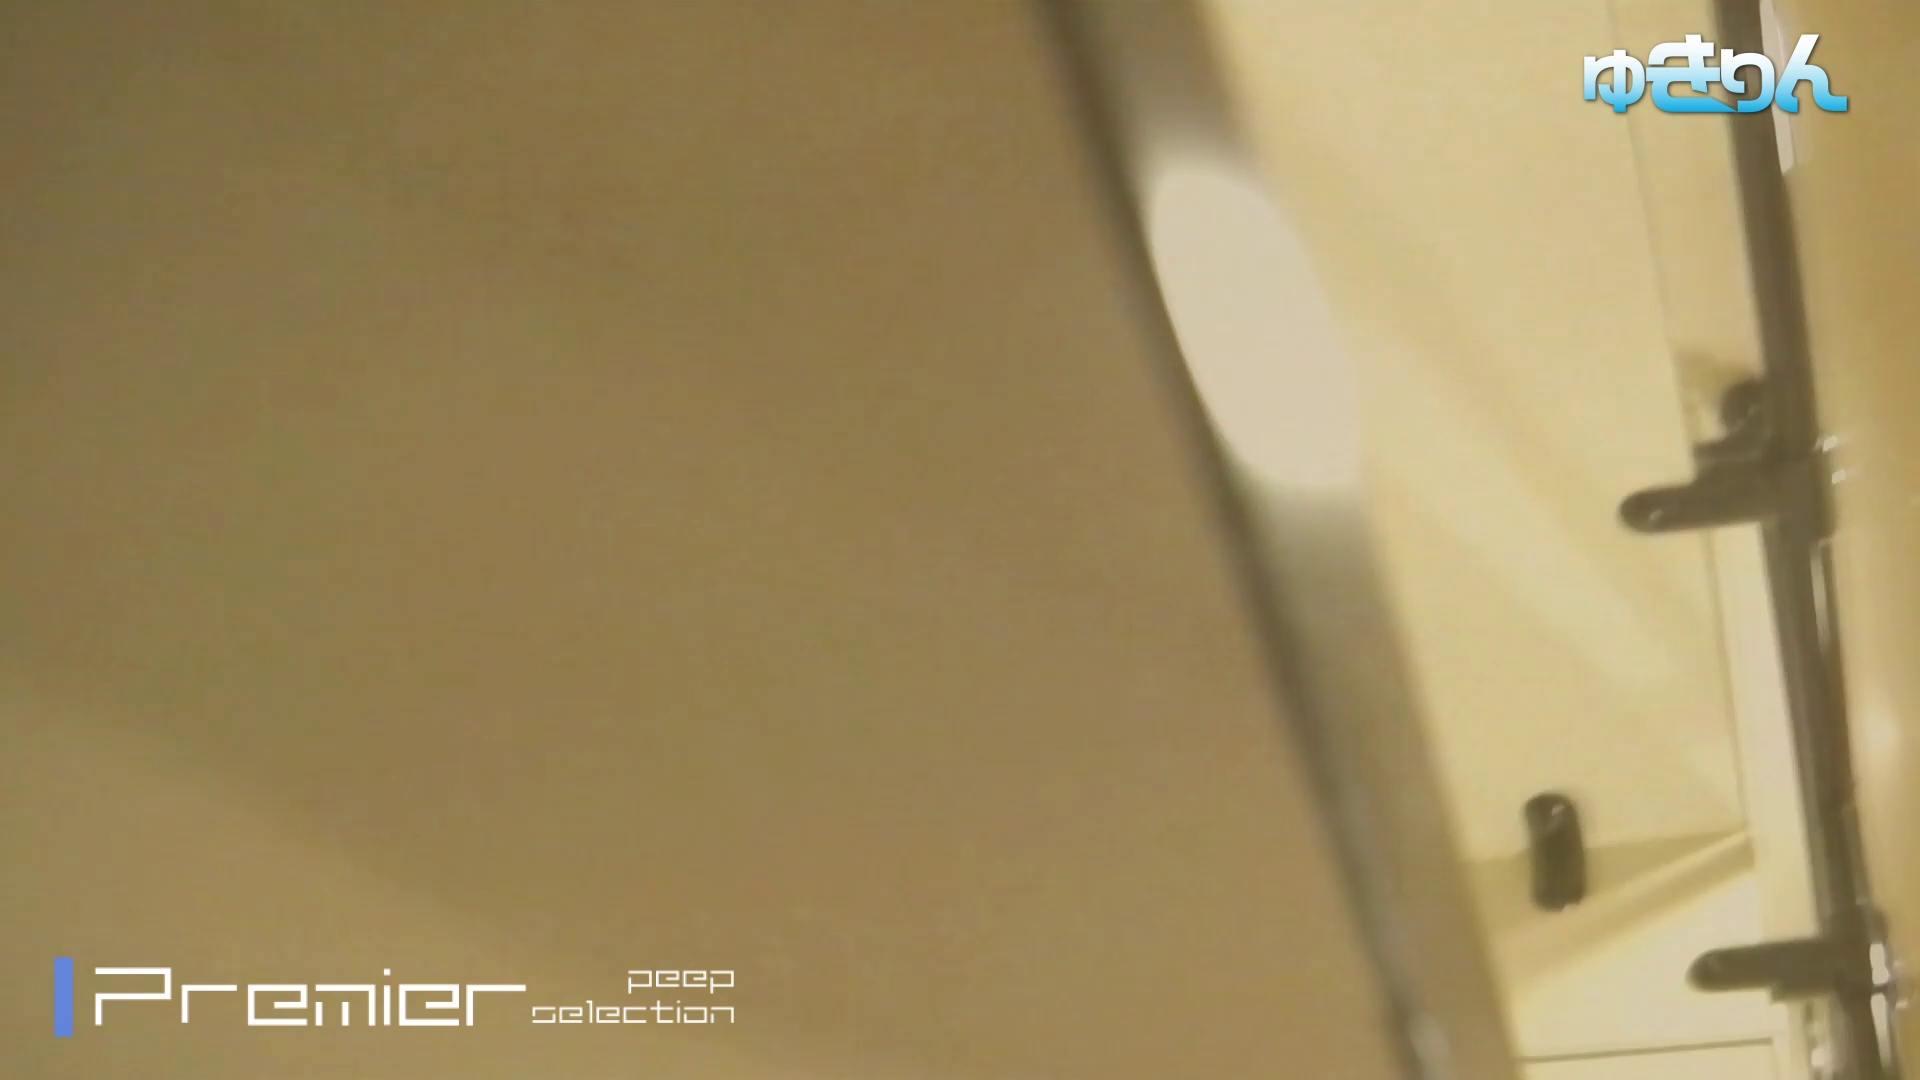 新世界の射窓 No92 黒髪、長身 170cm現場情報! 洗面所 オマンコ無修正動画無料 72画像 6